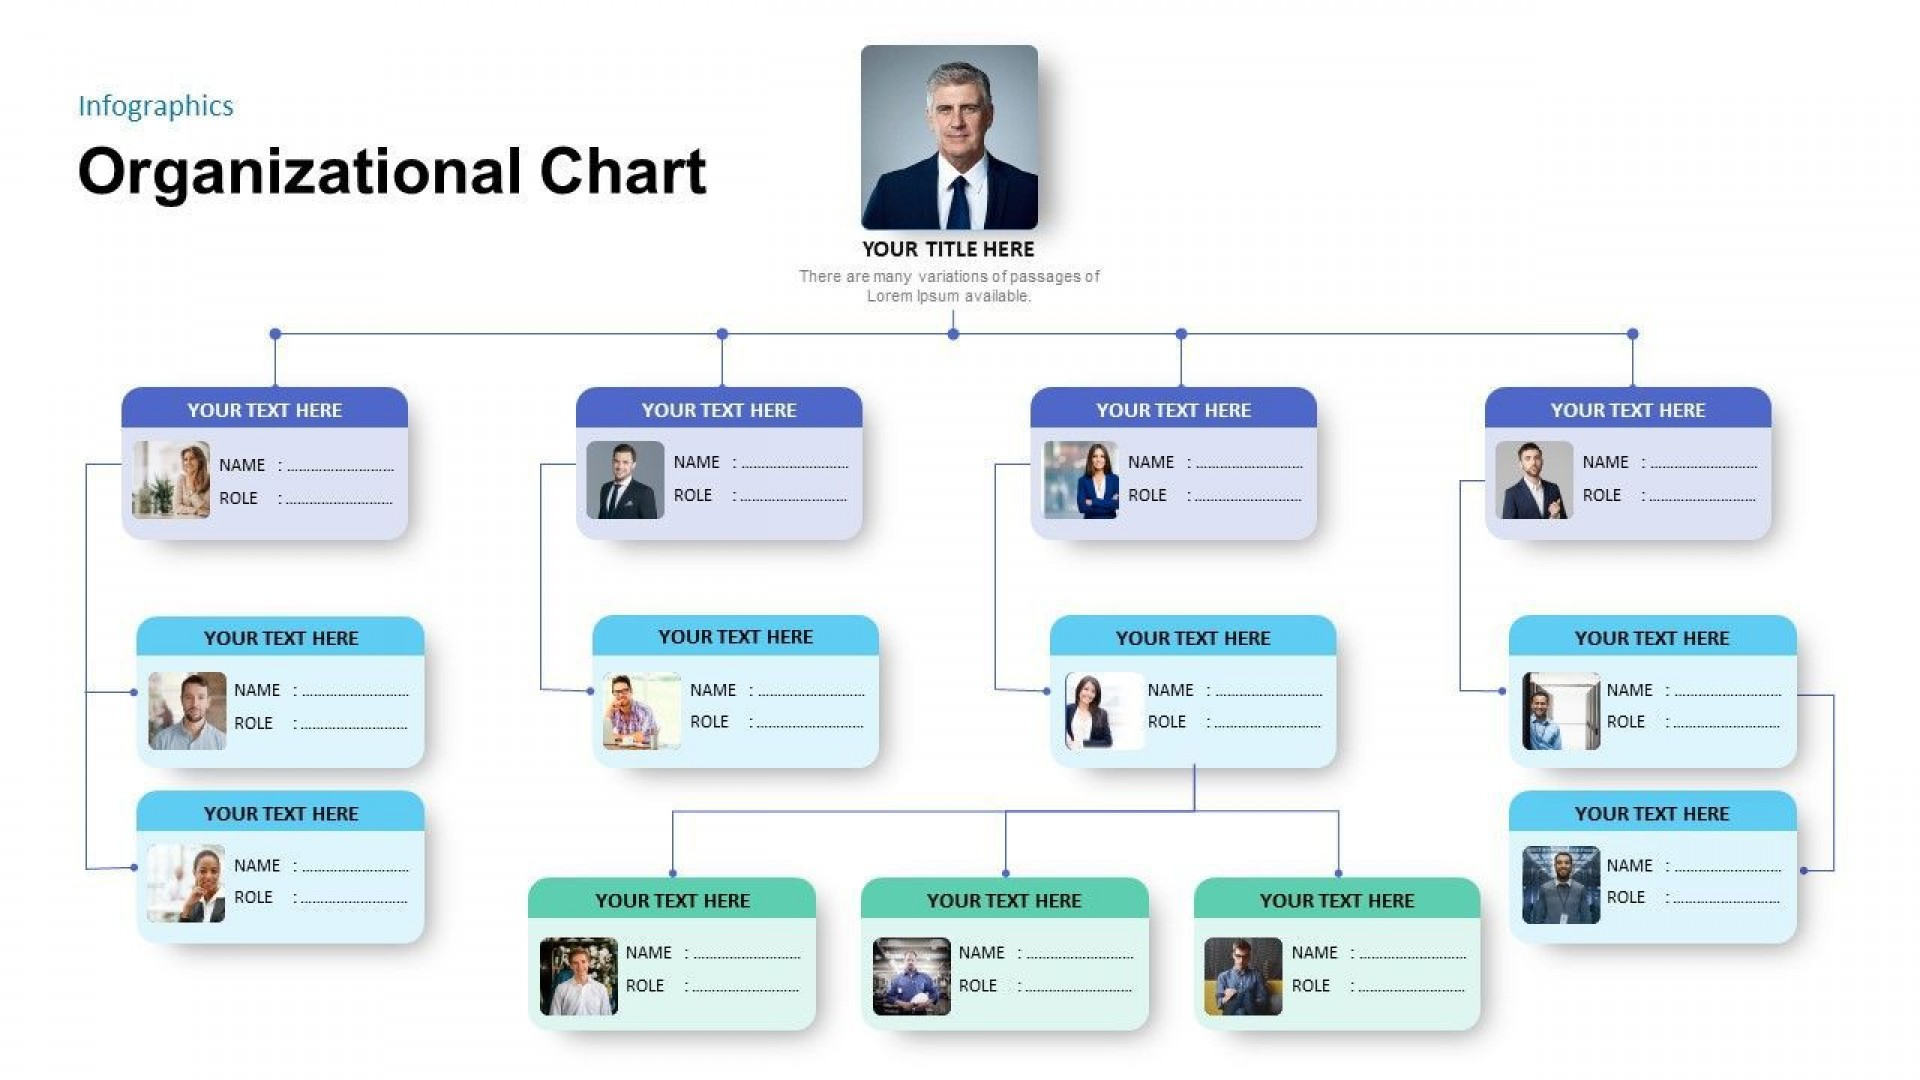 000 Fantastic Org Chart Template Powerpoint High Definition  Free Organization Download Organizational 20101920